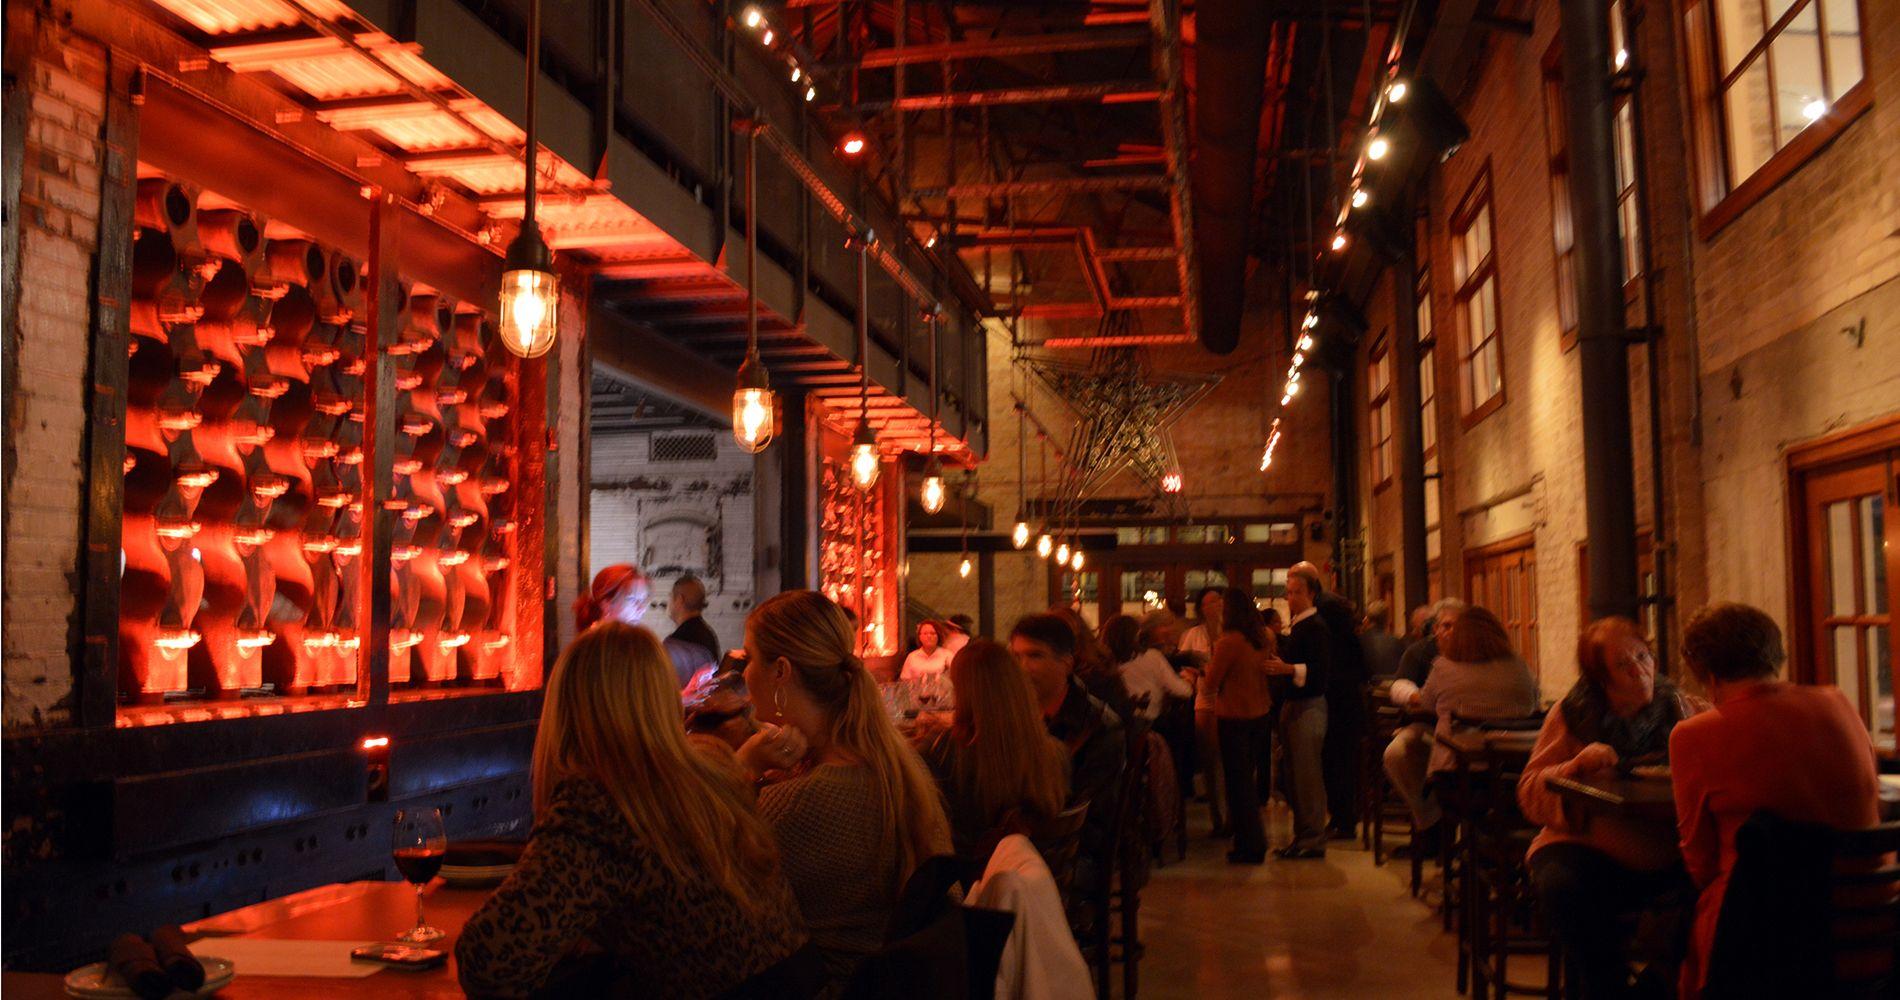 Boiler House San Antonio Restaurant With Texas Grill Wine Garden The Pearl San Antonio Restaurants Trip Advisor San Antonio